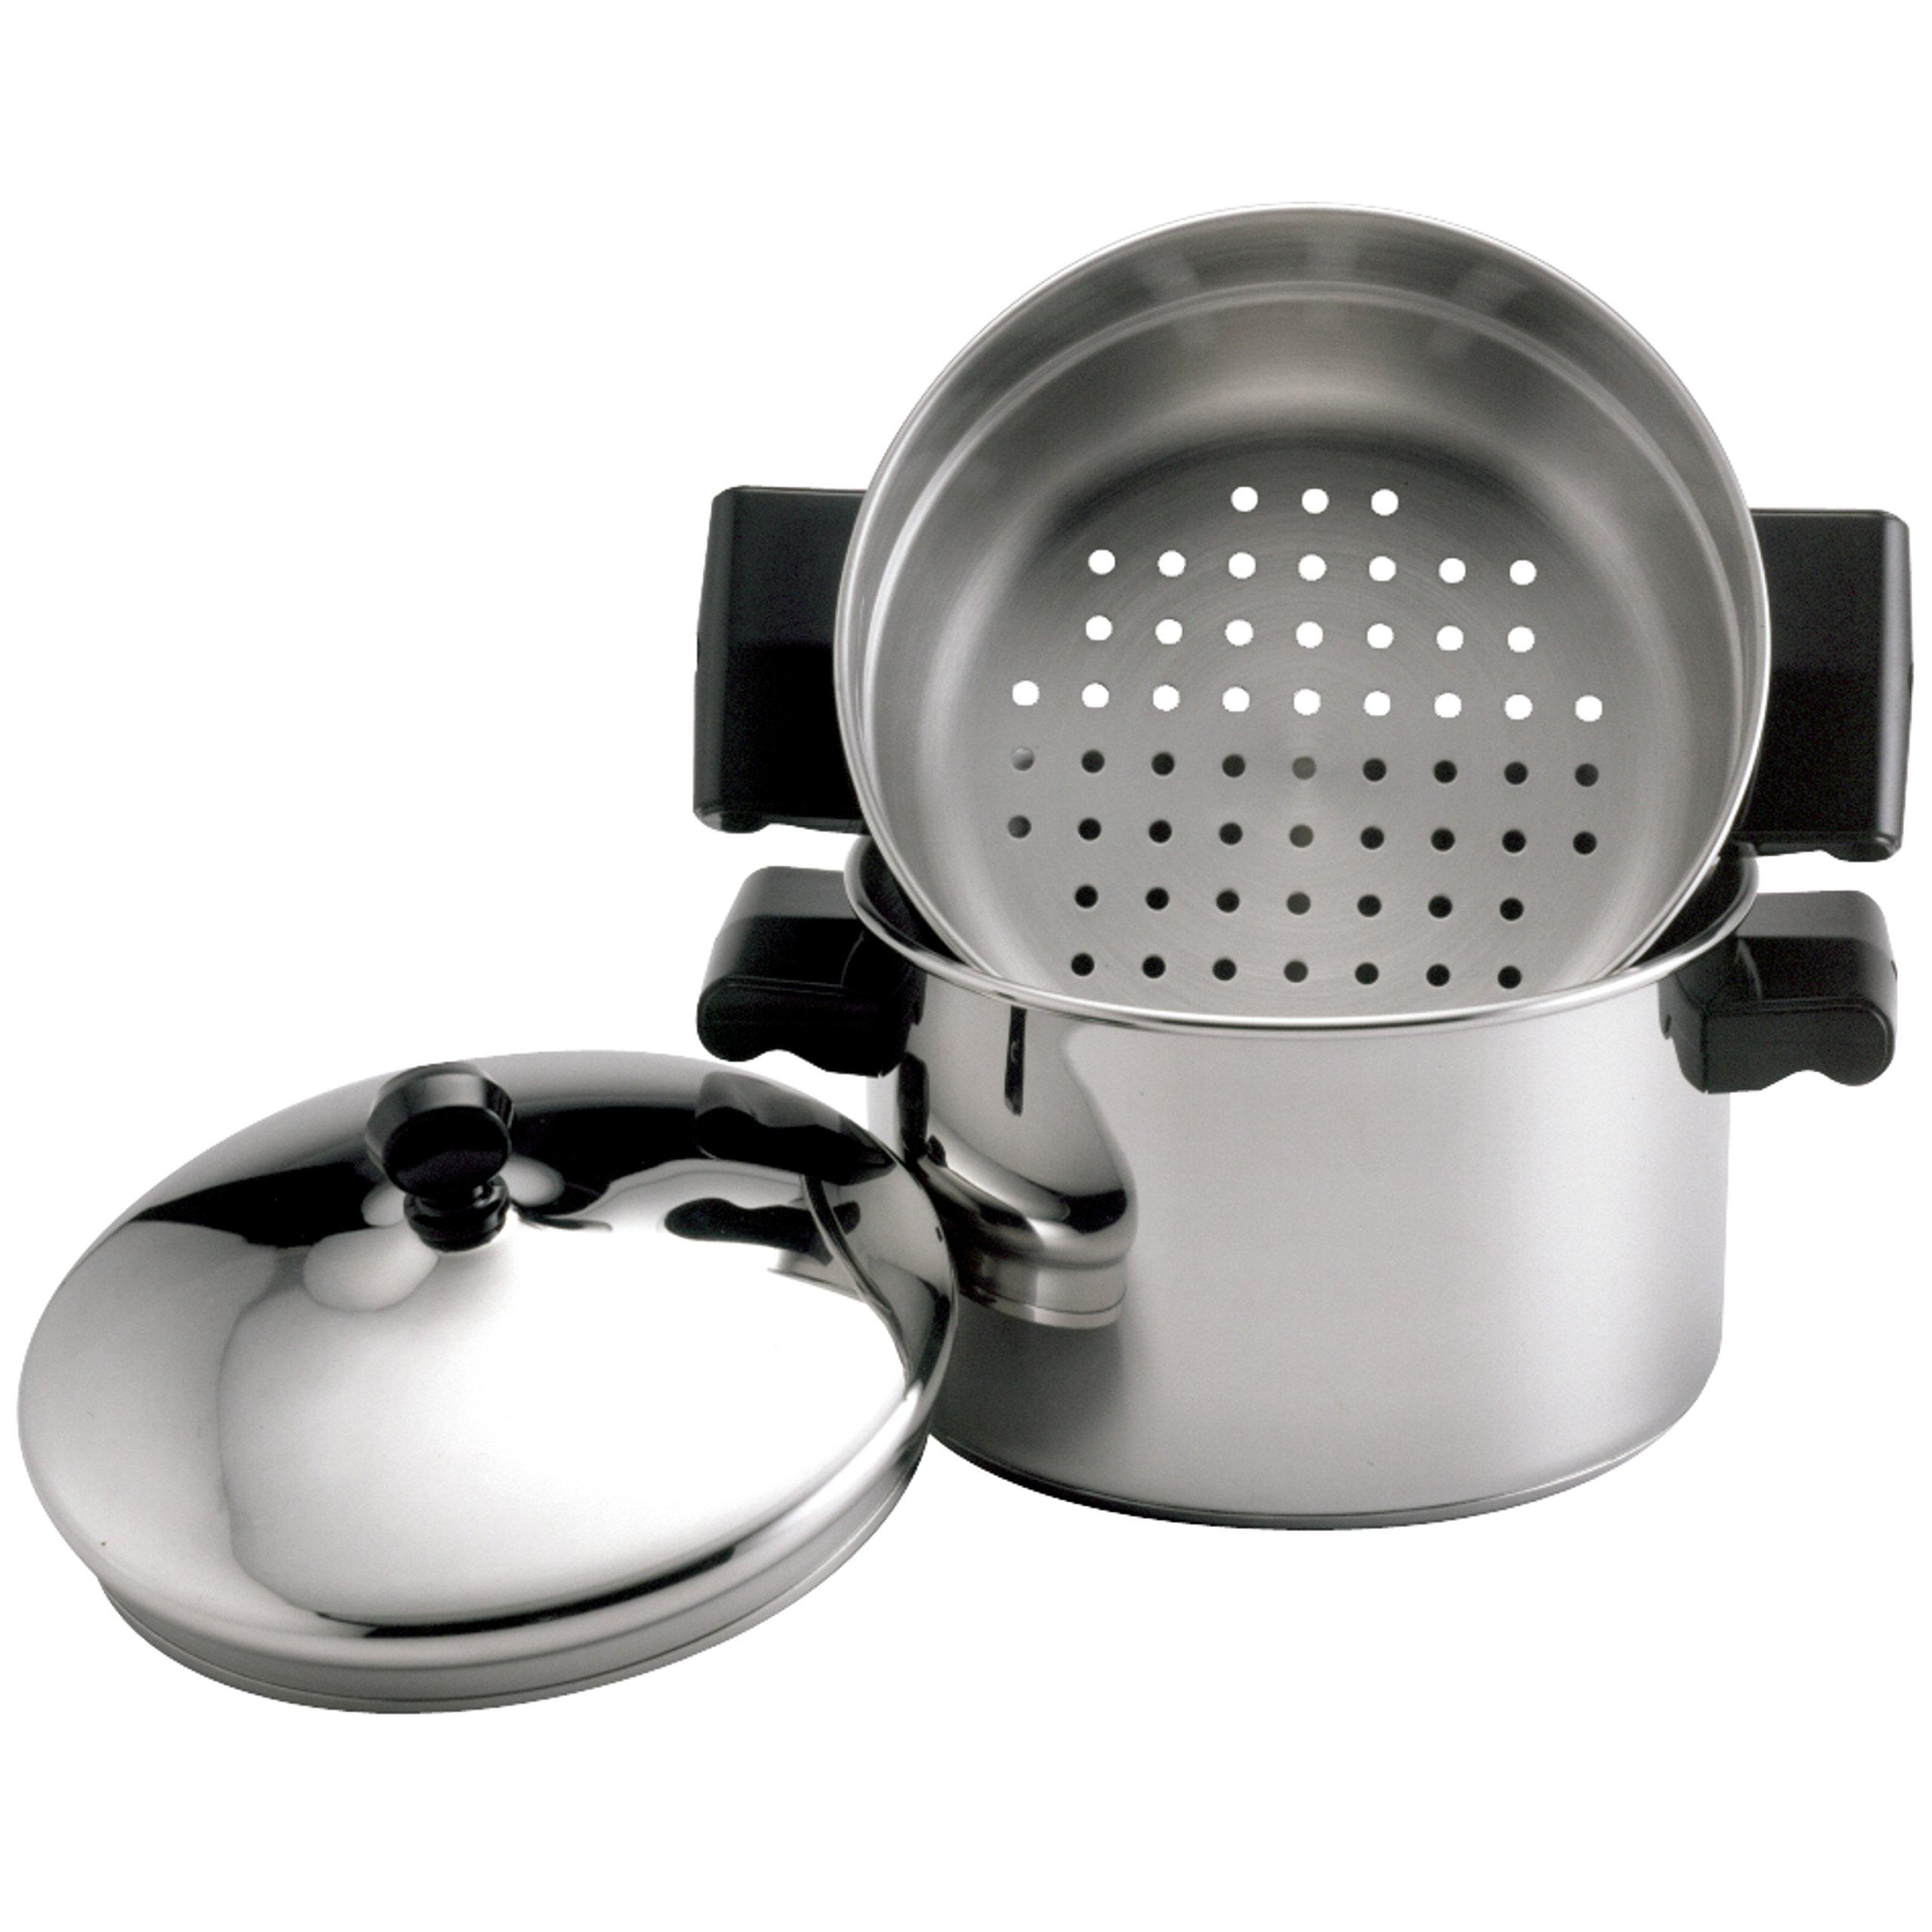 Farberware 70043 Stack 'N' Steam 3-Qt. Covered Saucepot Insert Stainless Steel Steamer Set, 3-Quart by Farberware